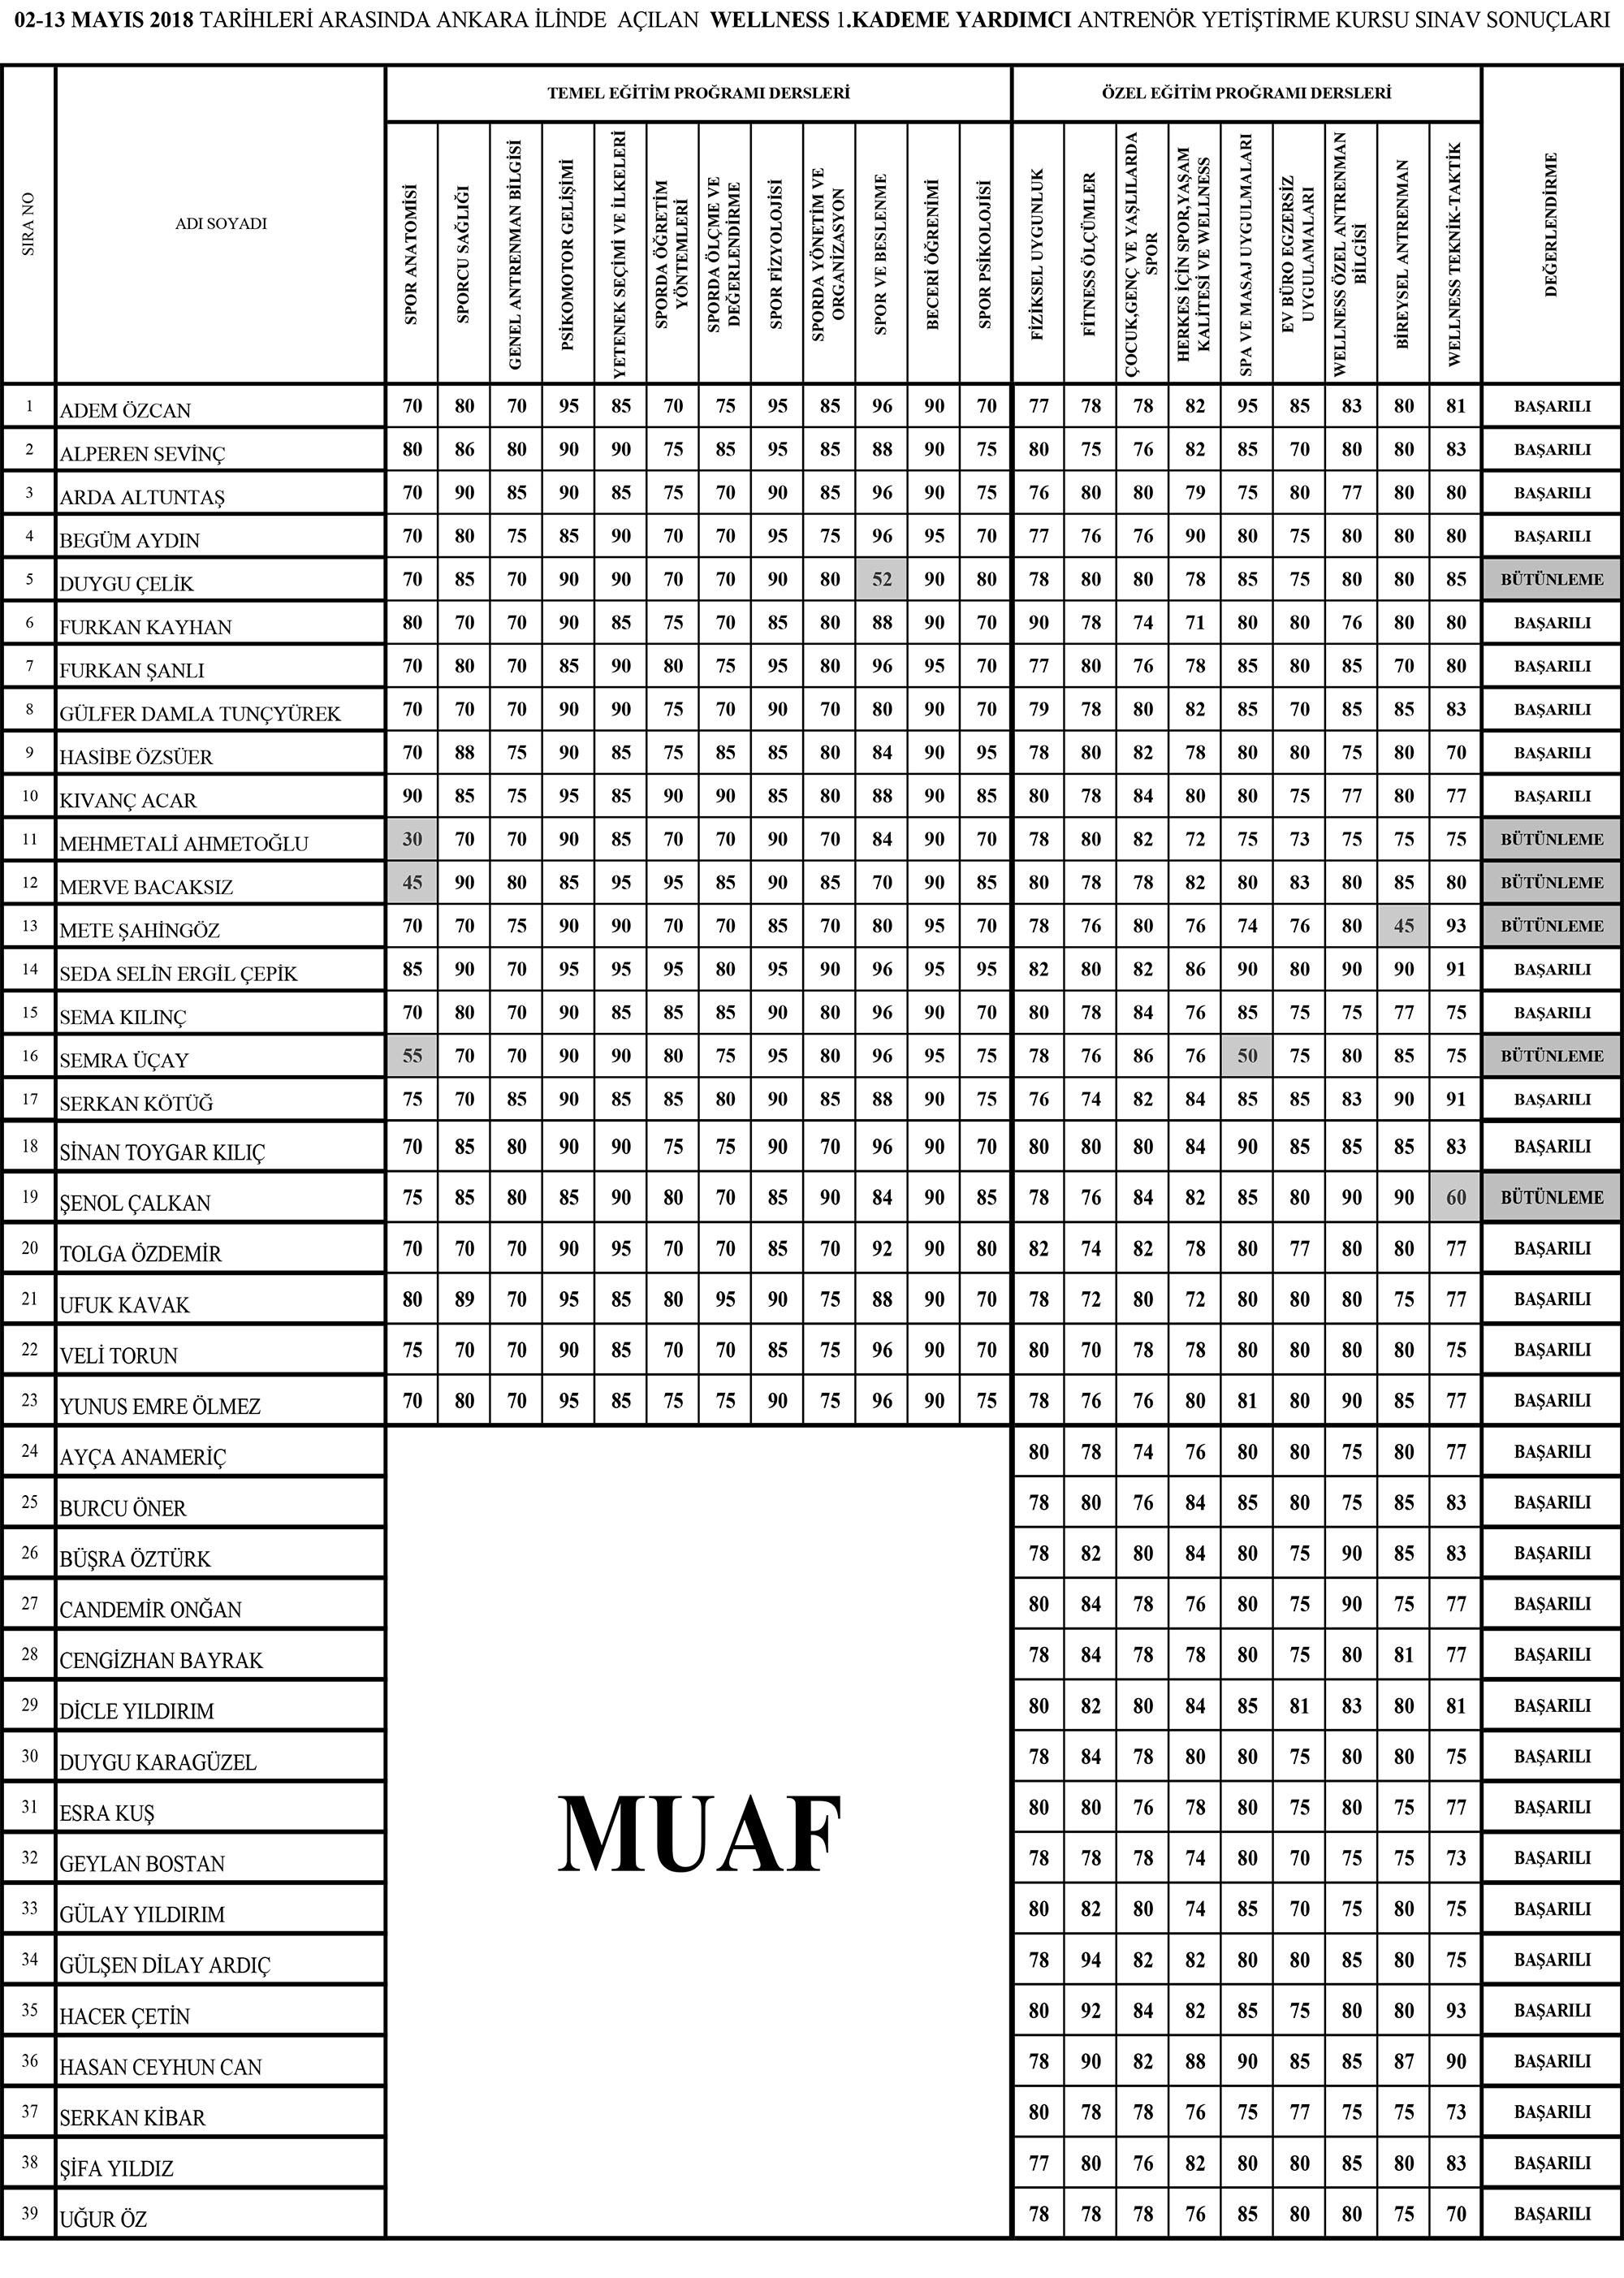 ANKARA-02-13-MAYIS-LIST